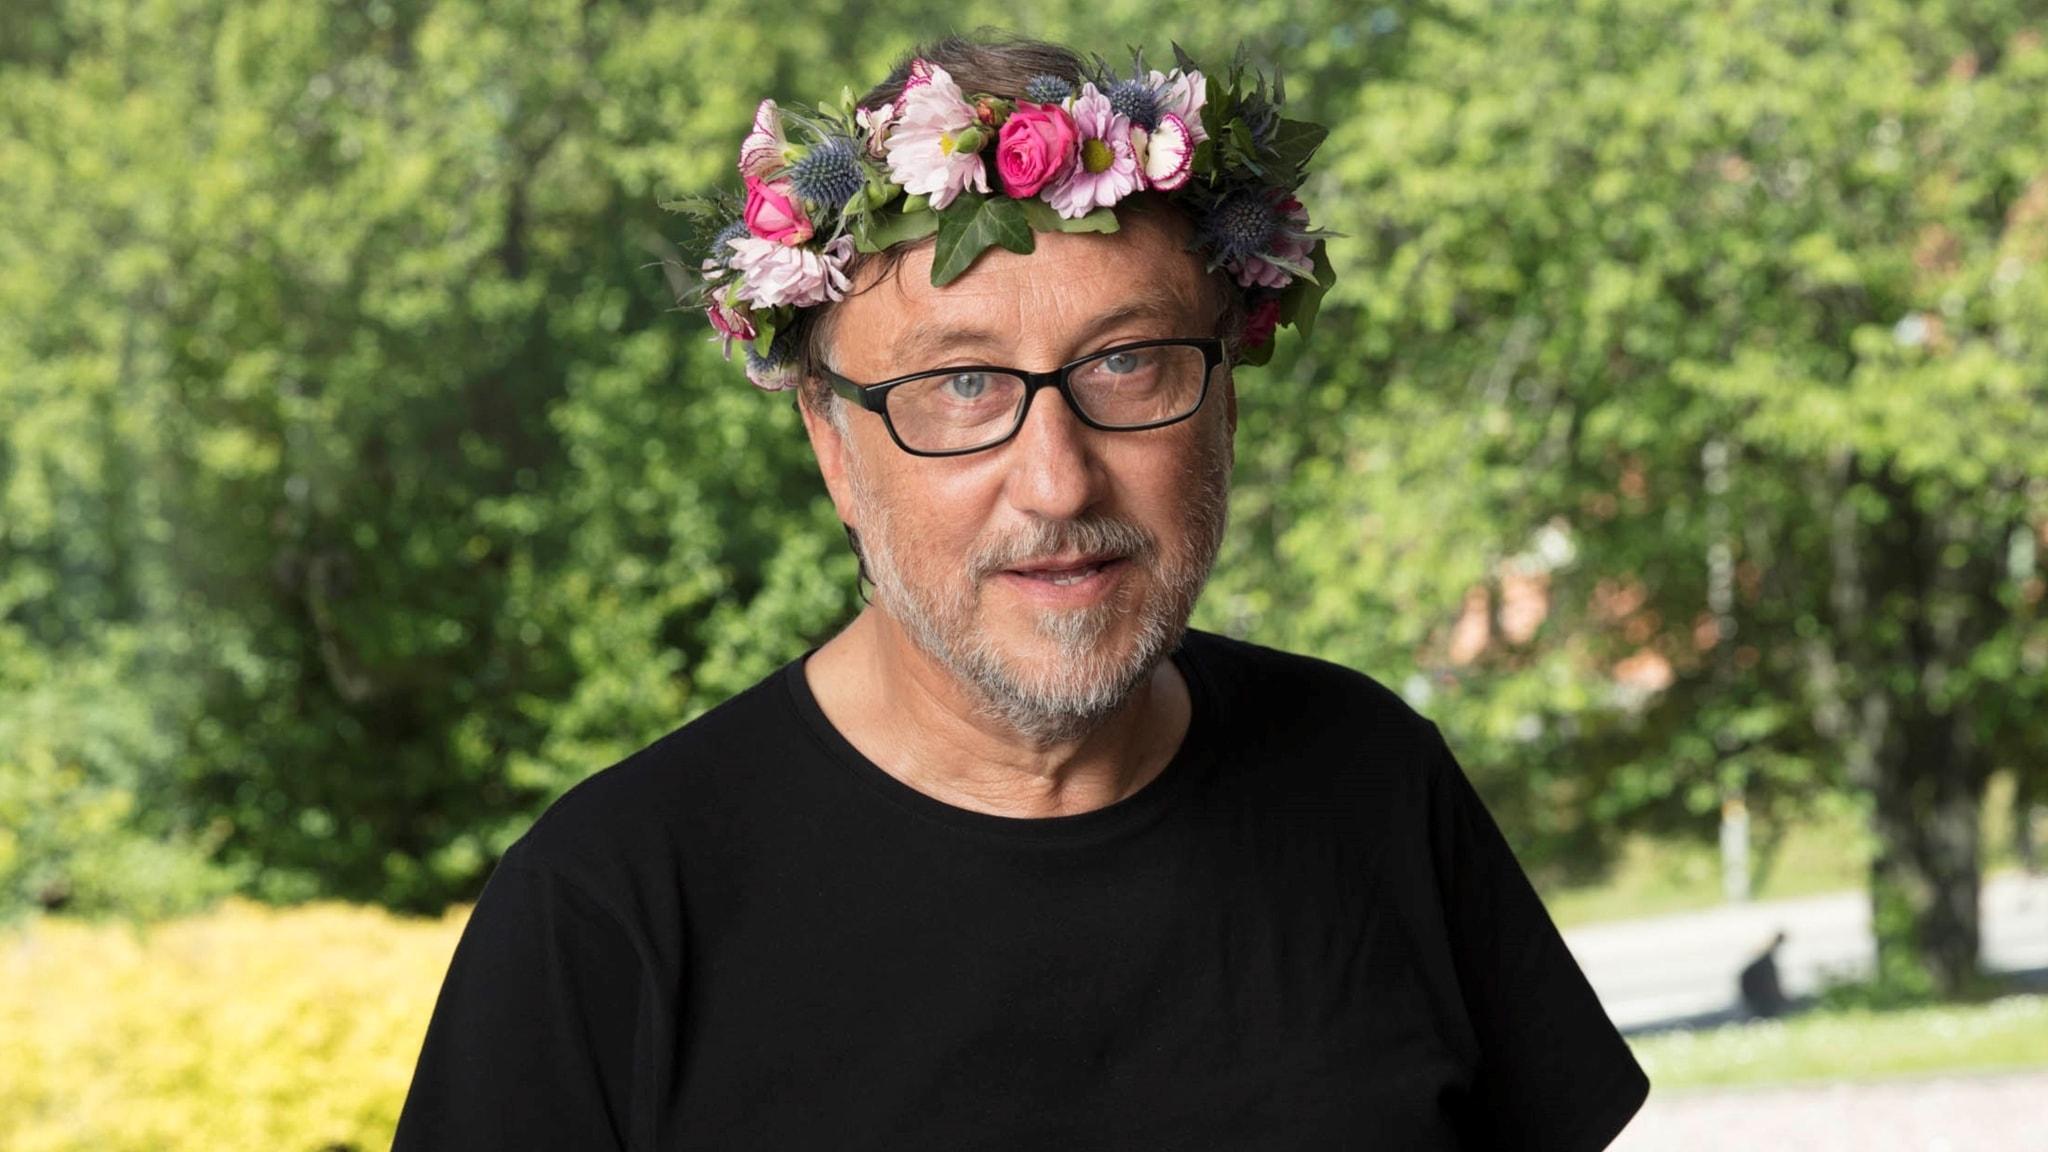 Janne Josefsson